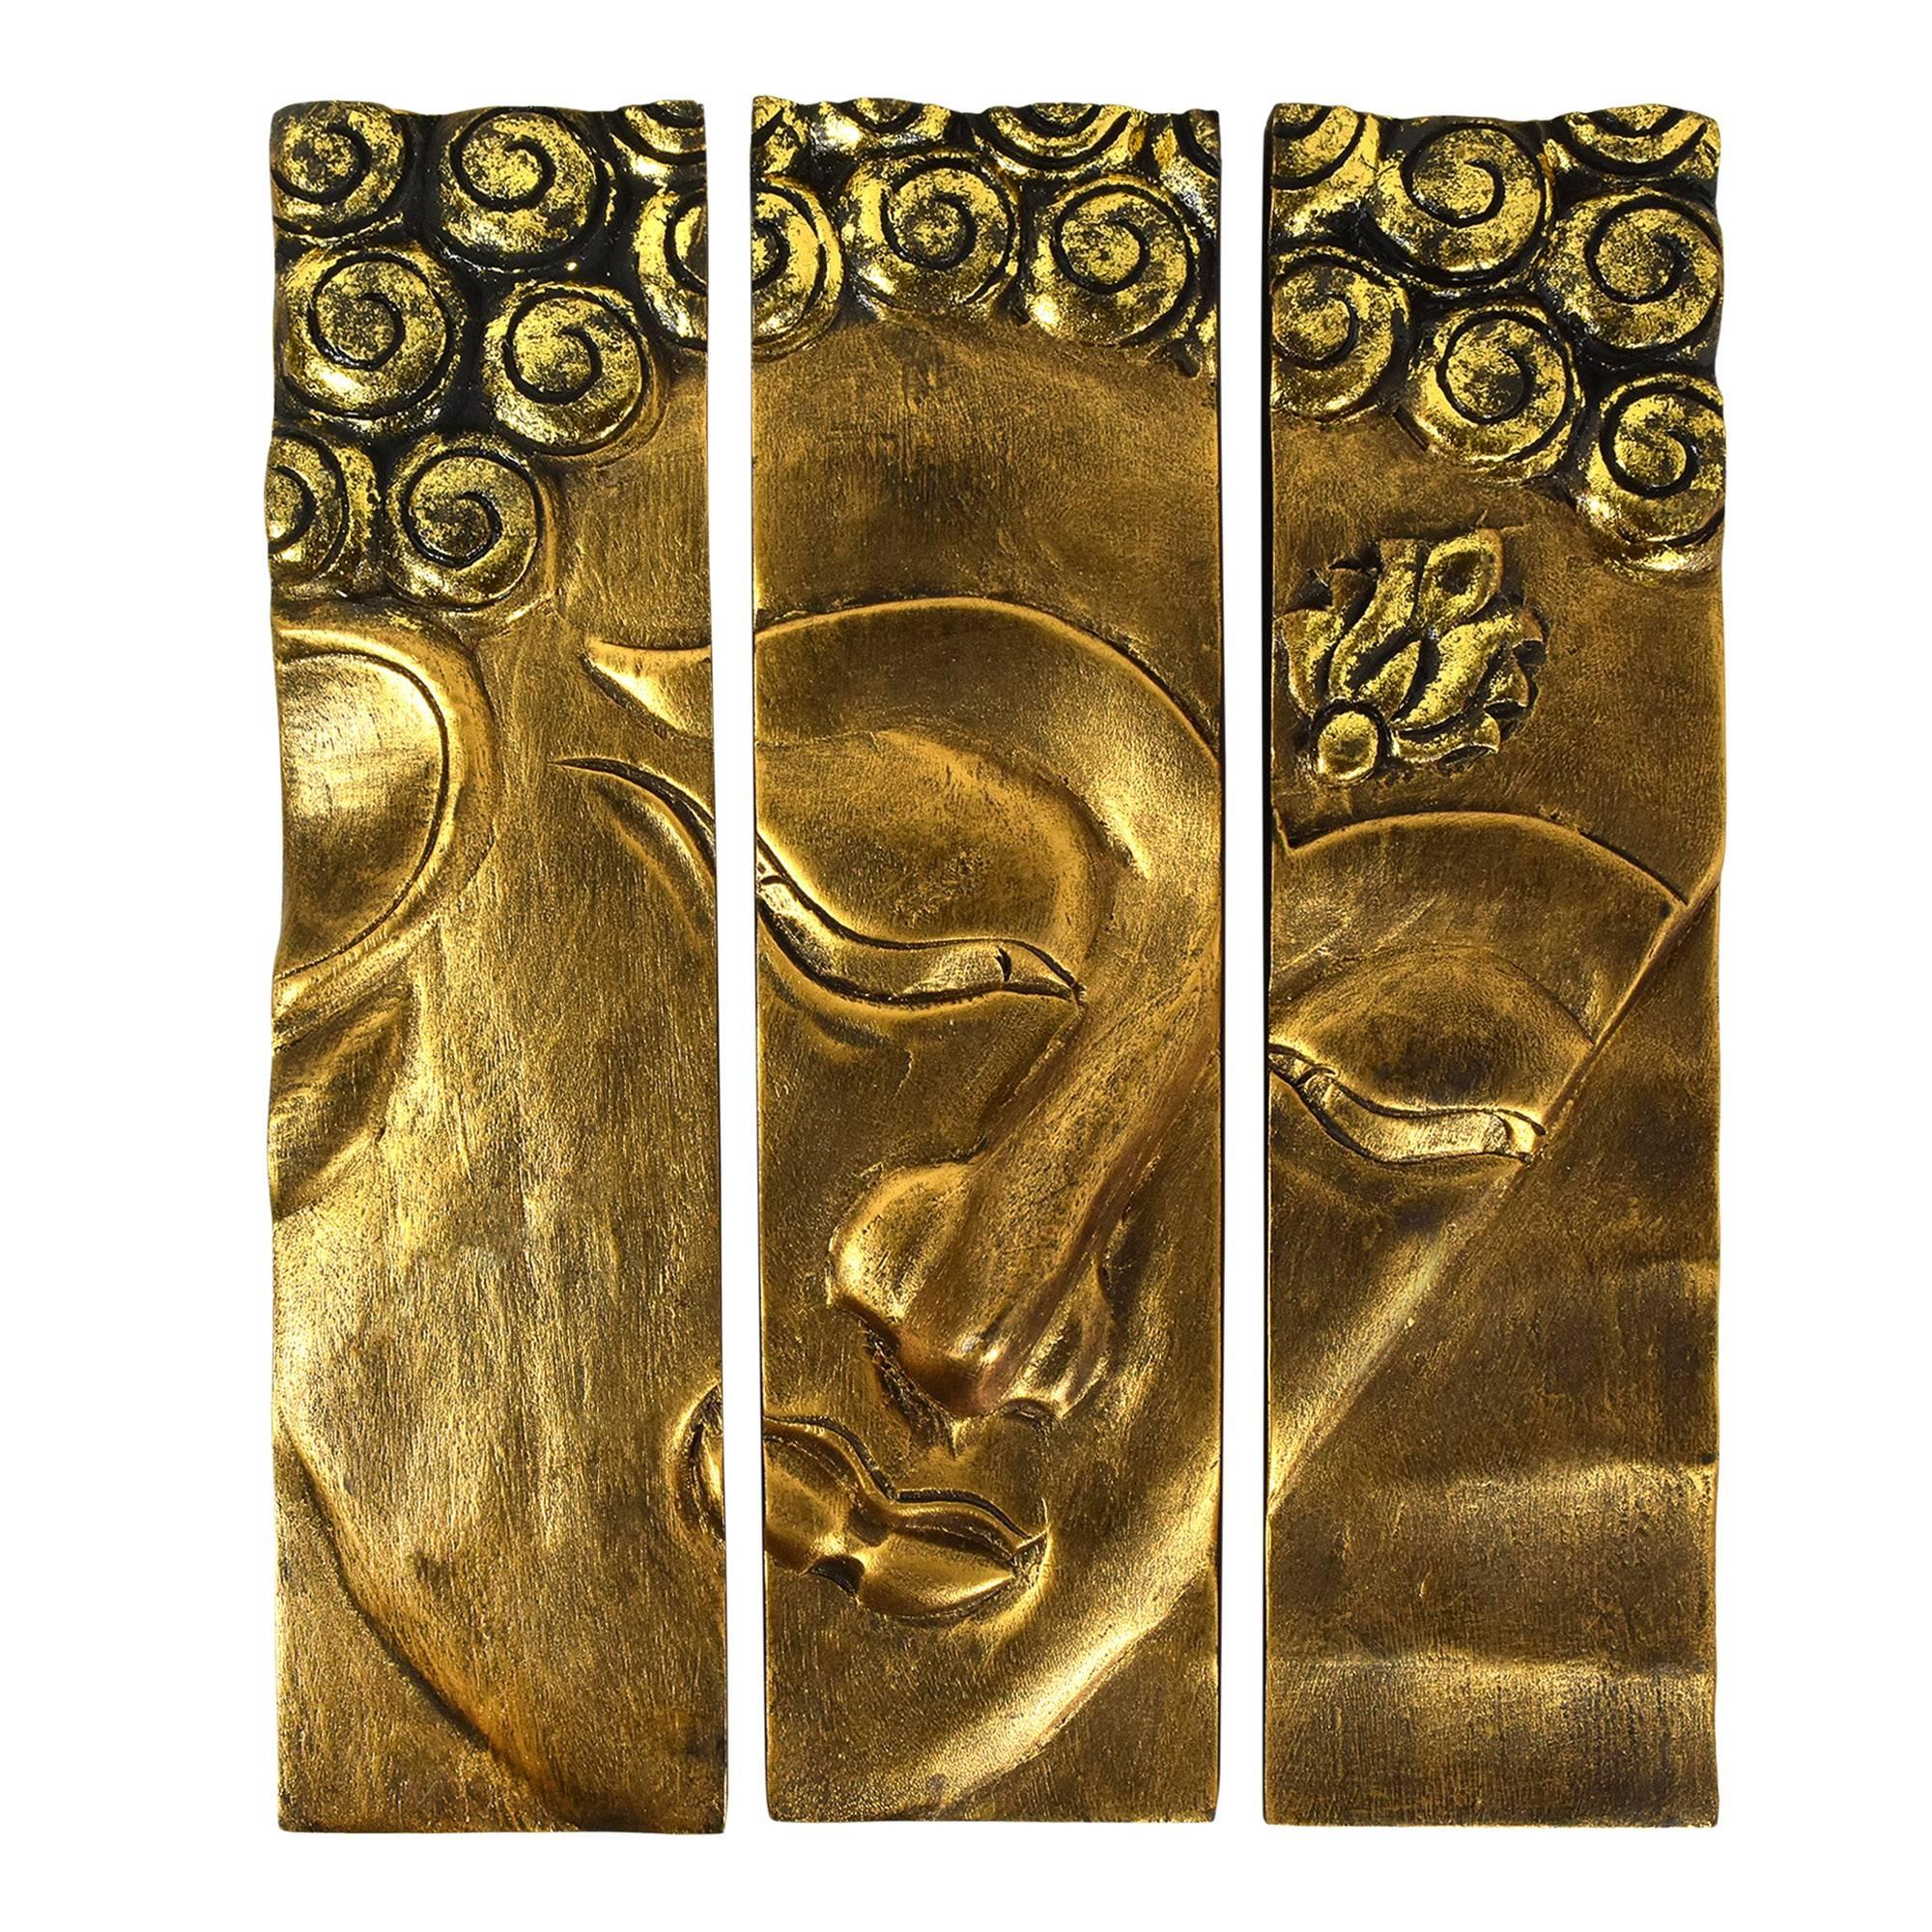 Golden Buddha Face Three Panel Hanging Handmade Wall Art 12x15 Inside 2017 Buddha Wood Wall Art (View 7 of 20)